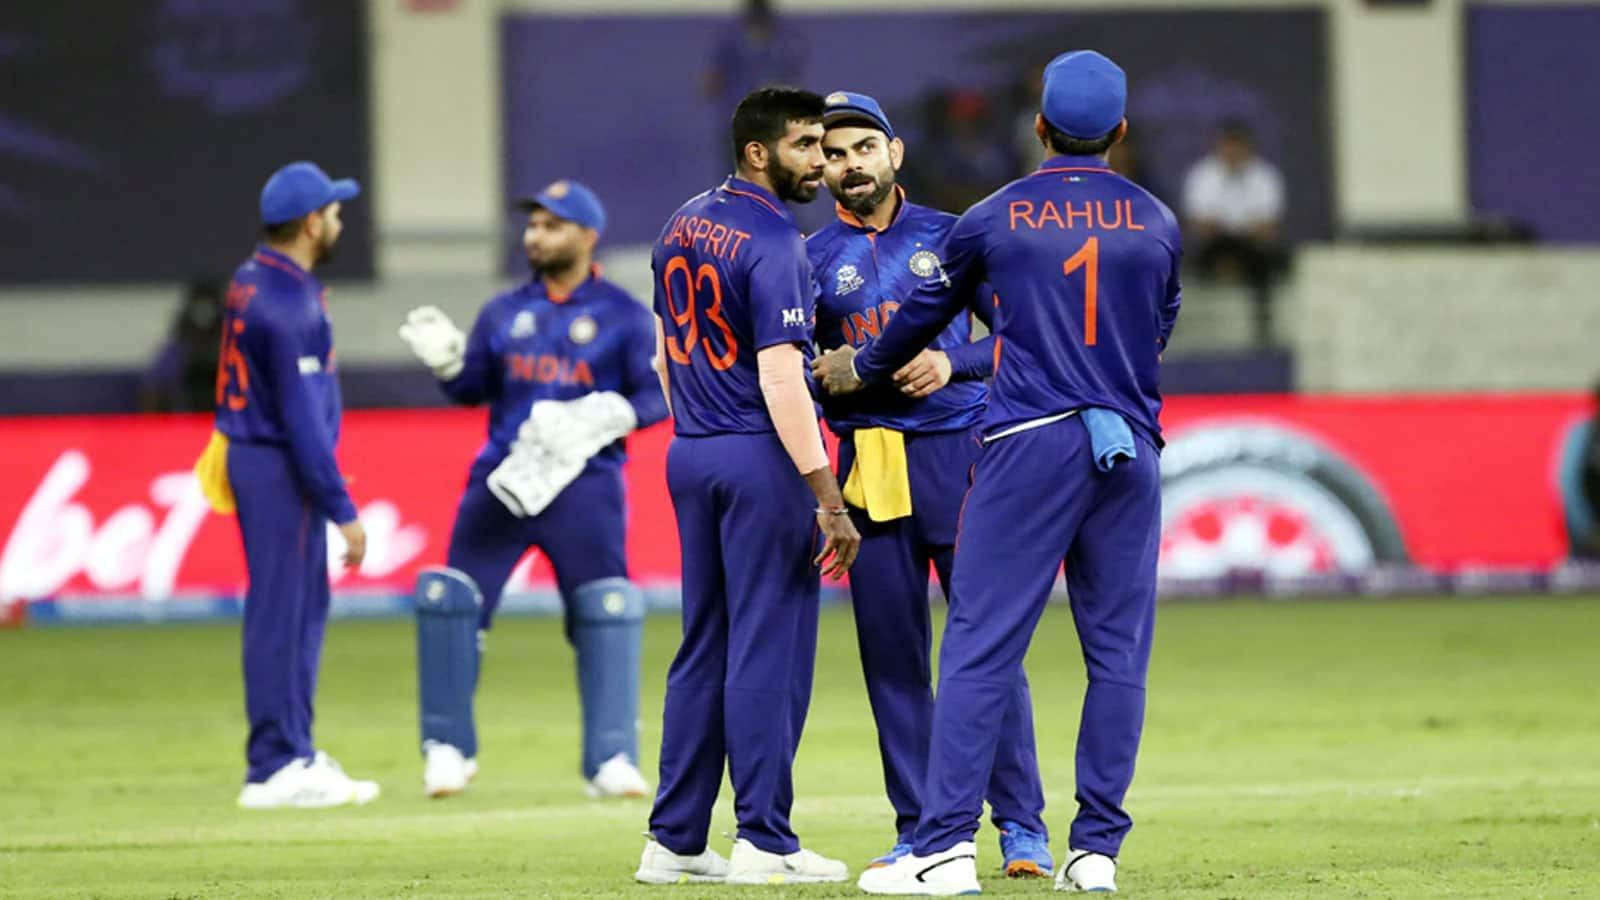 T20 World Cup 2021: Will Virat Kohli drop 'out of form' Suryakumar Yadav after India's humiliating loss to Pakistan? thumbnail